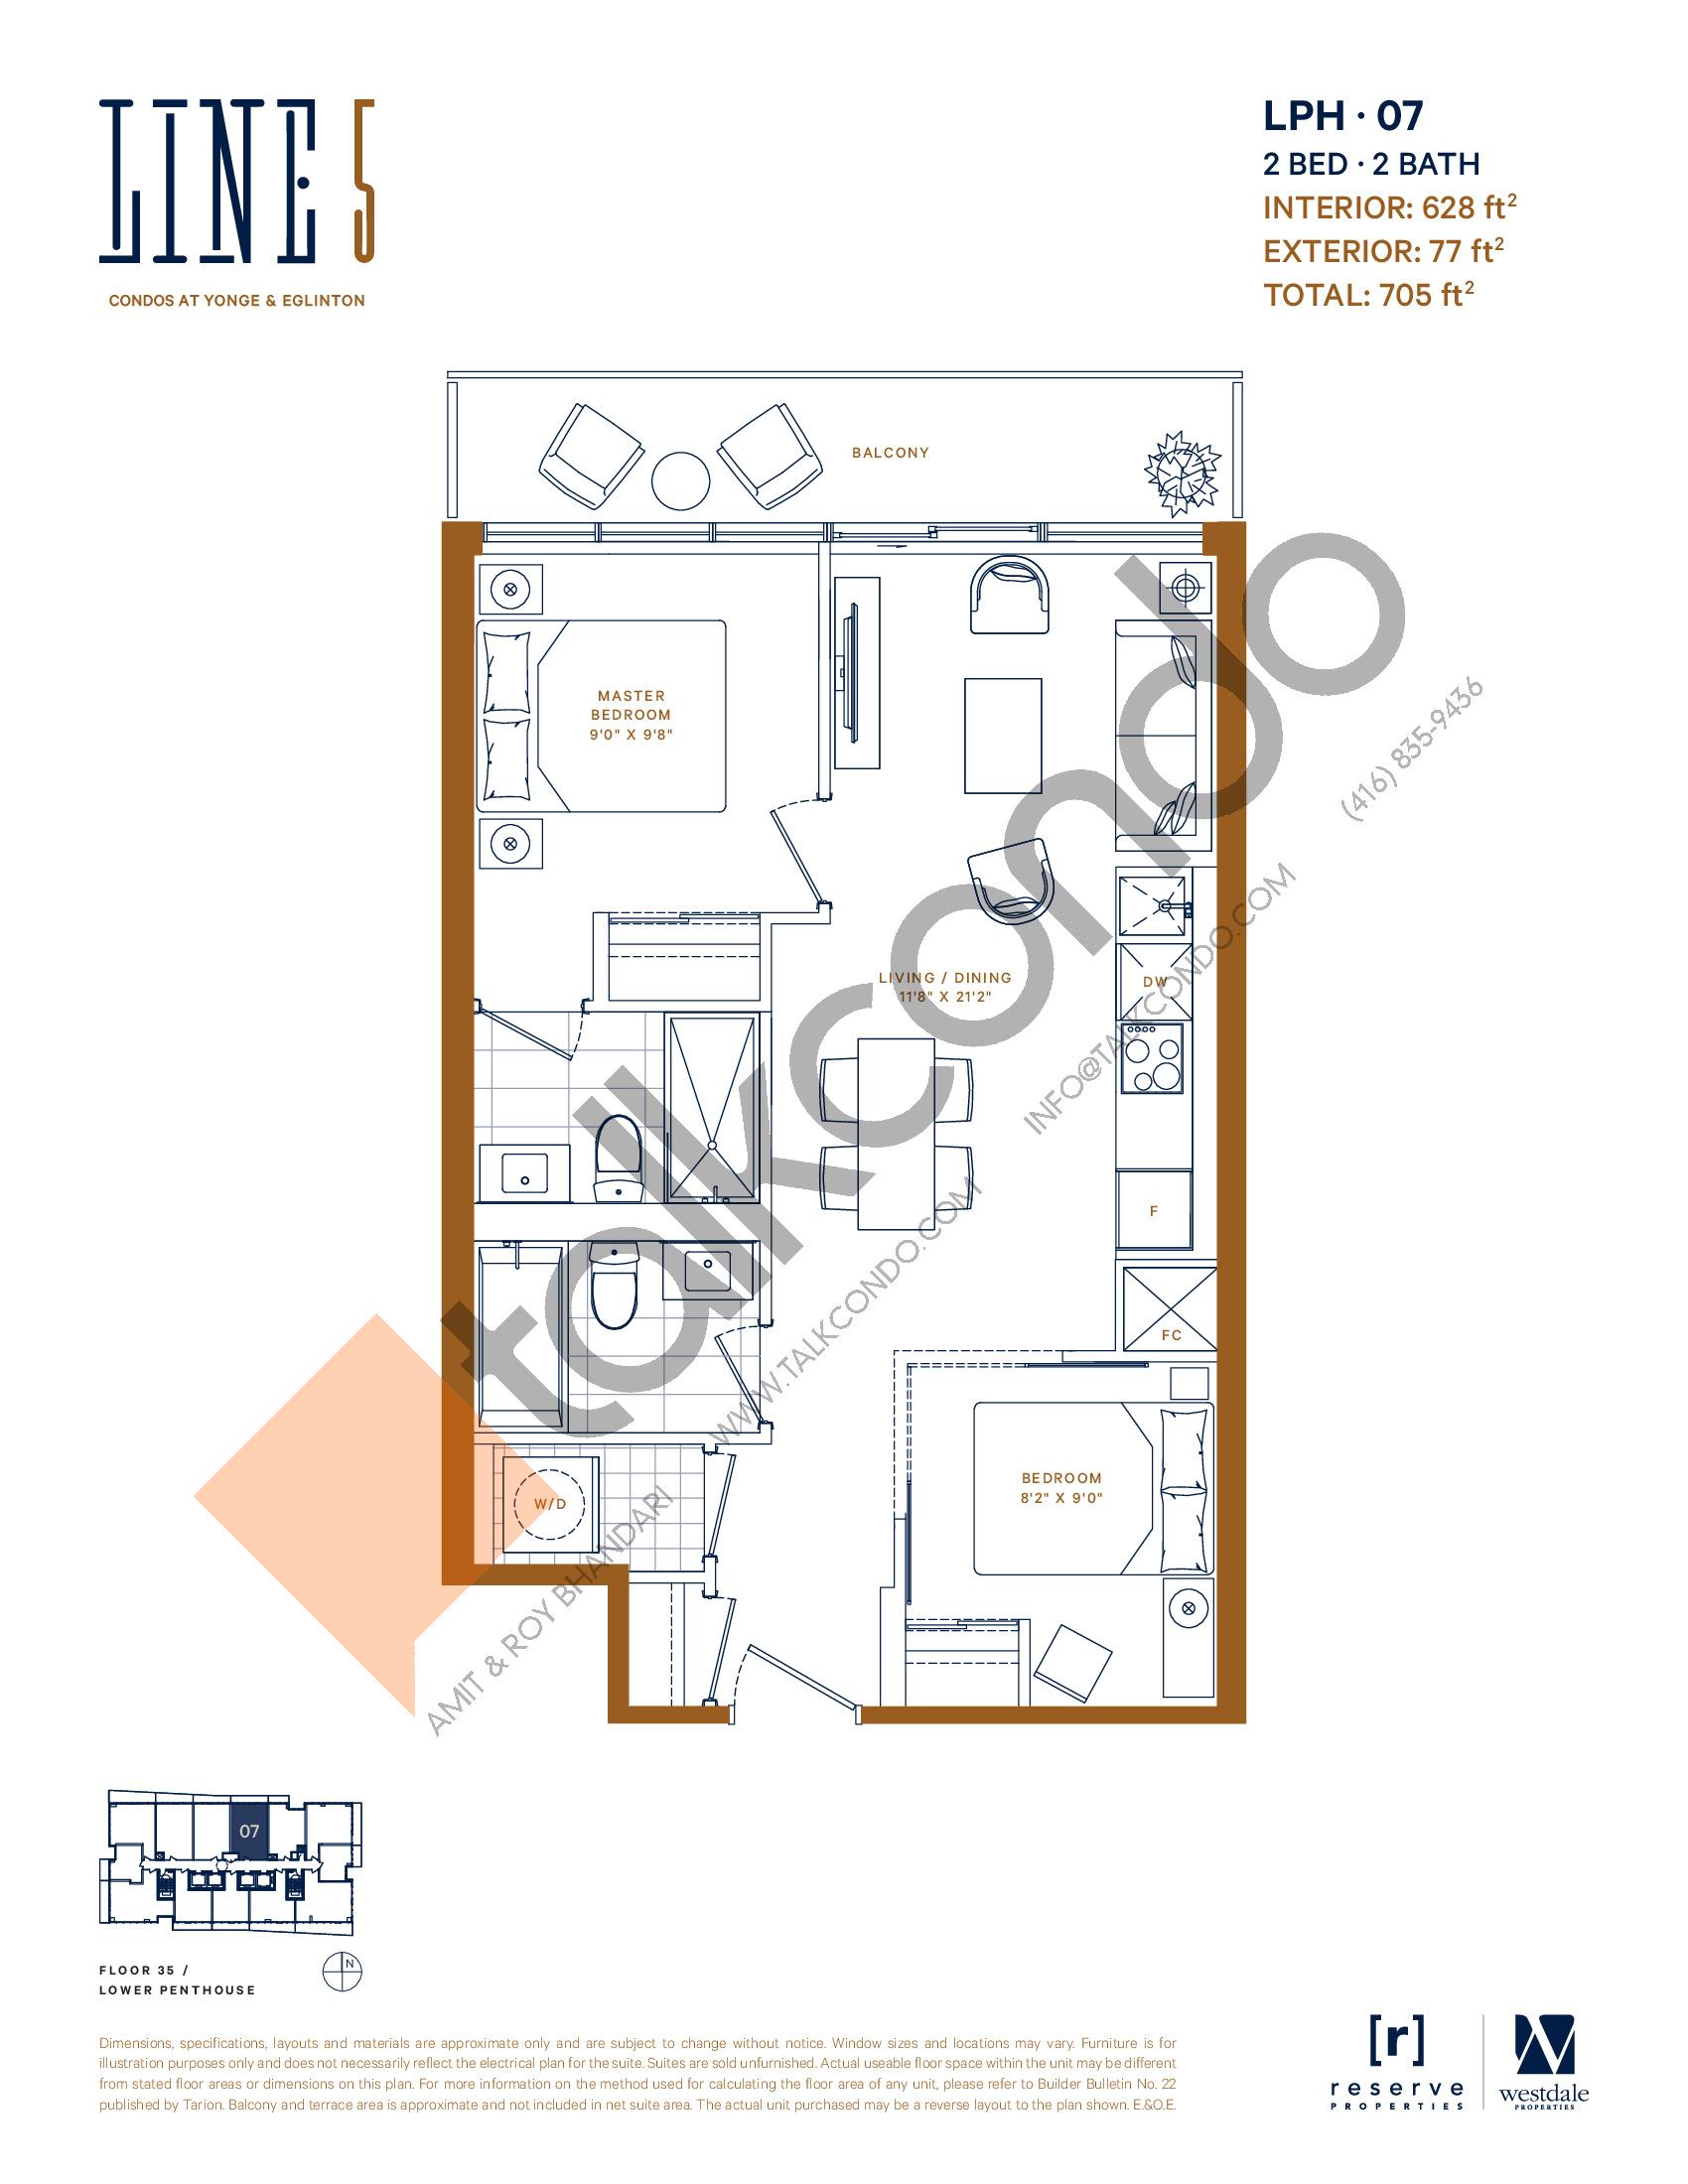 LPH-07 Floor Plan at Line 5 Condos - 628 sq.ft